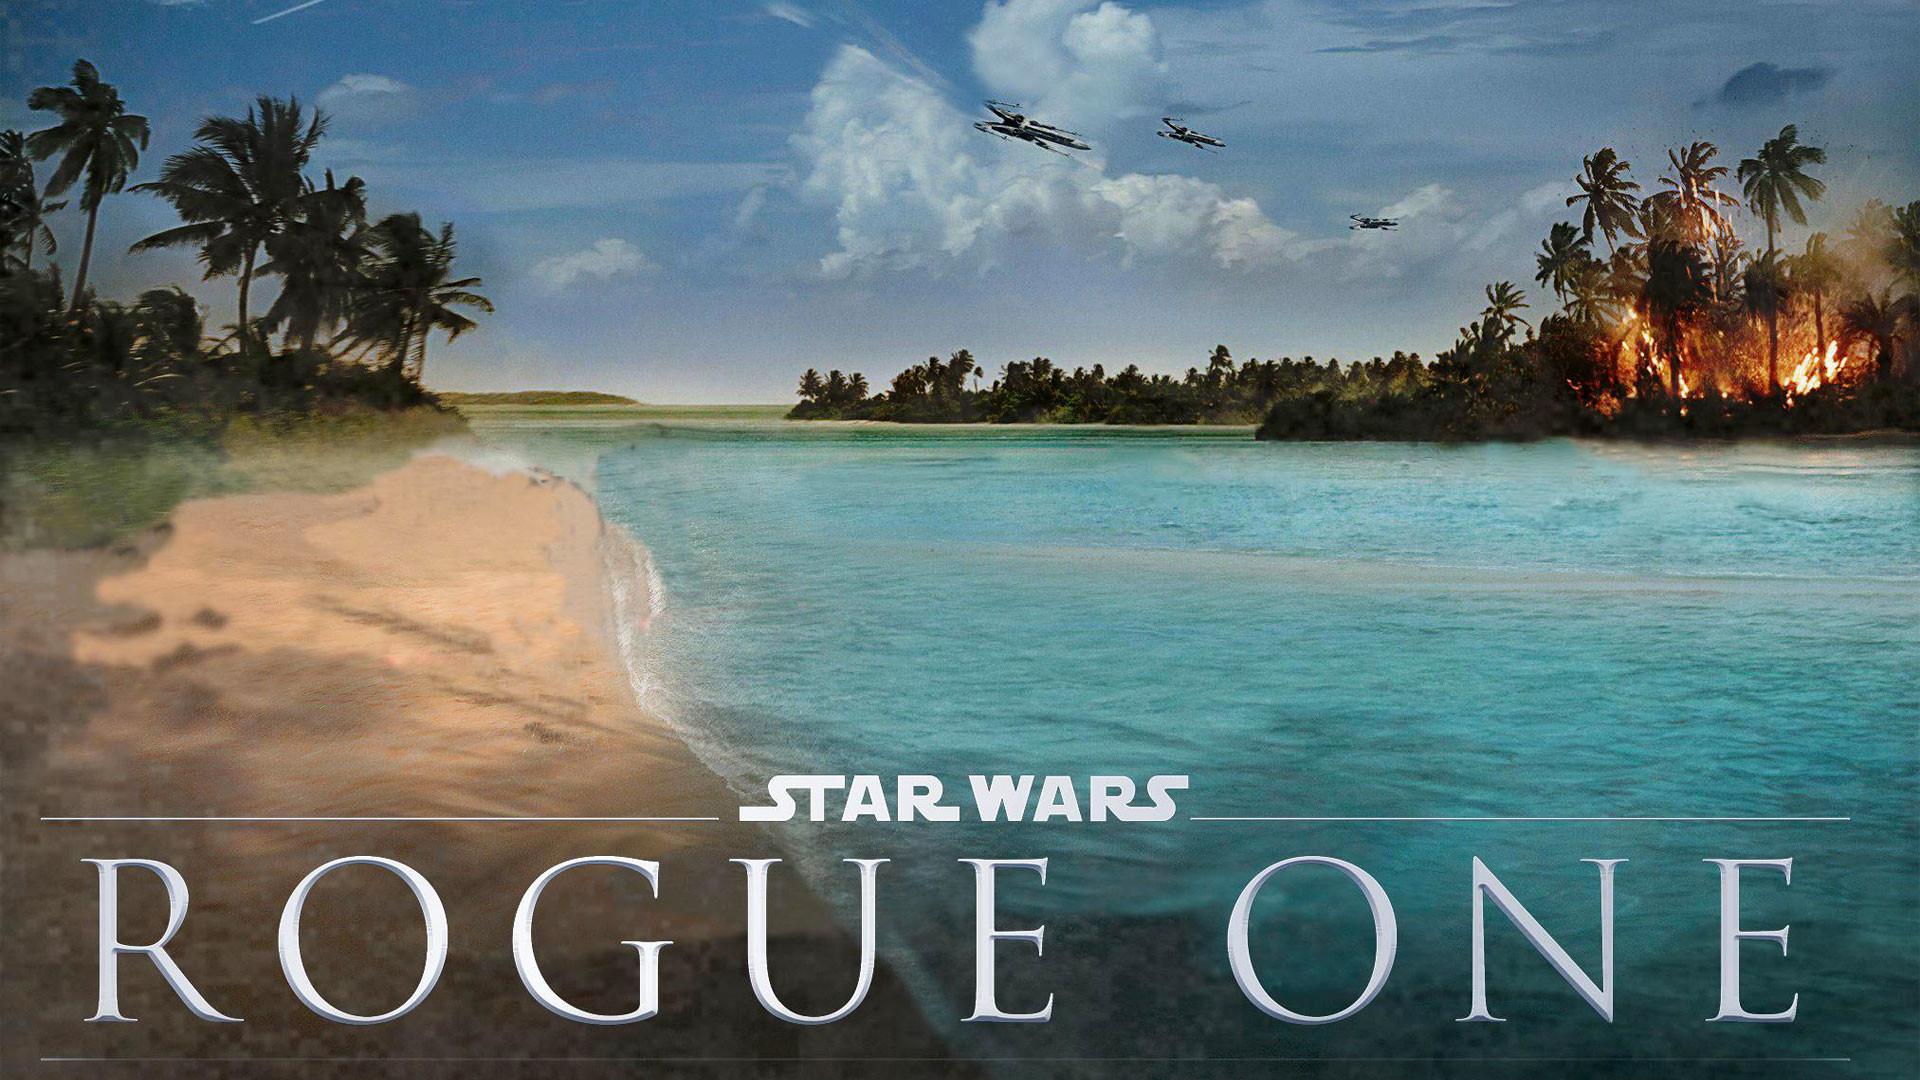 Star Wars Rogue One – Landscape Concept Art wallpaper